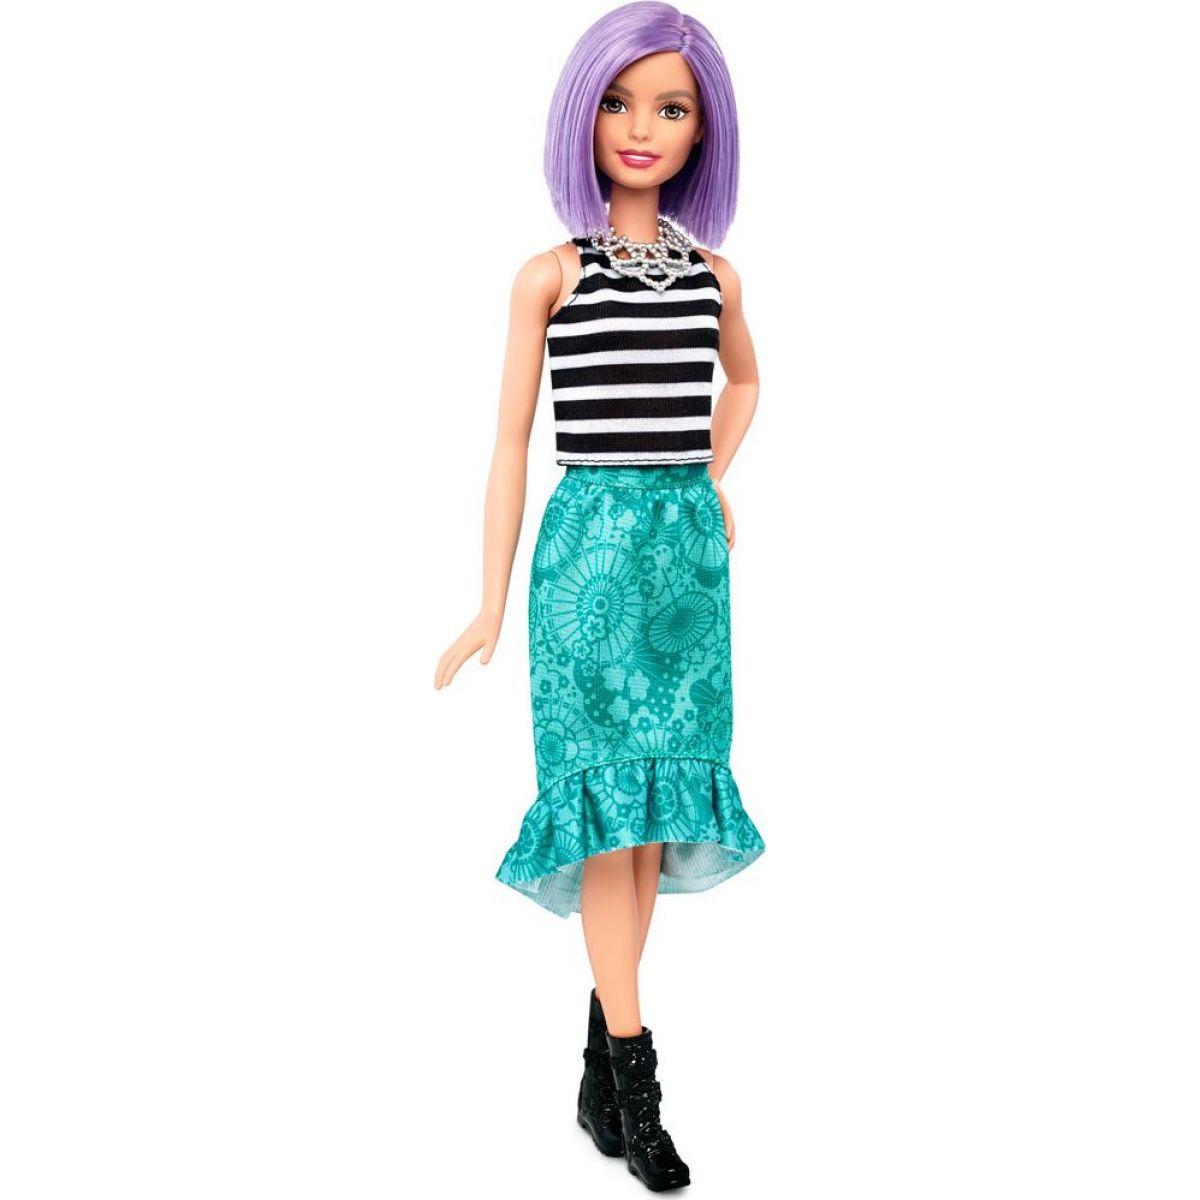 Barbie Modelka - DGY59